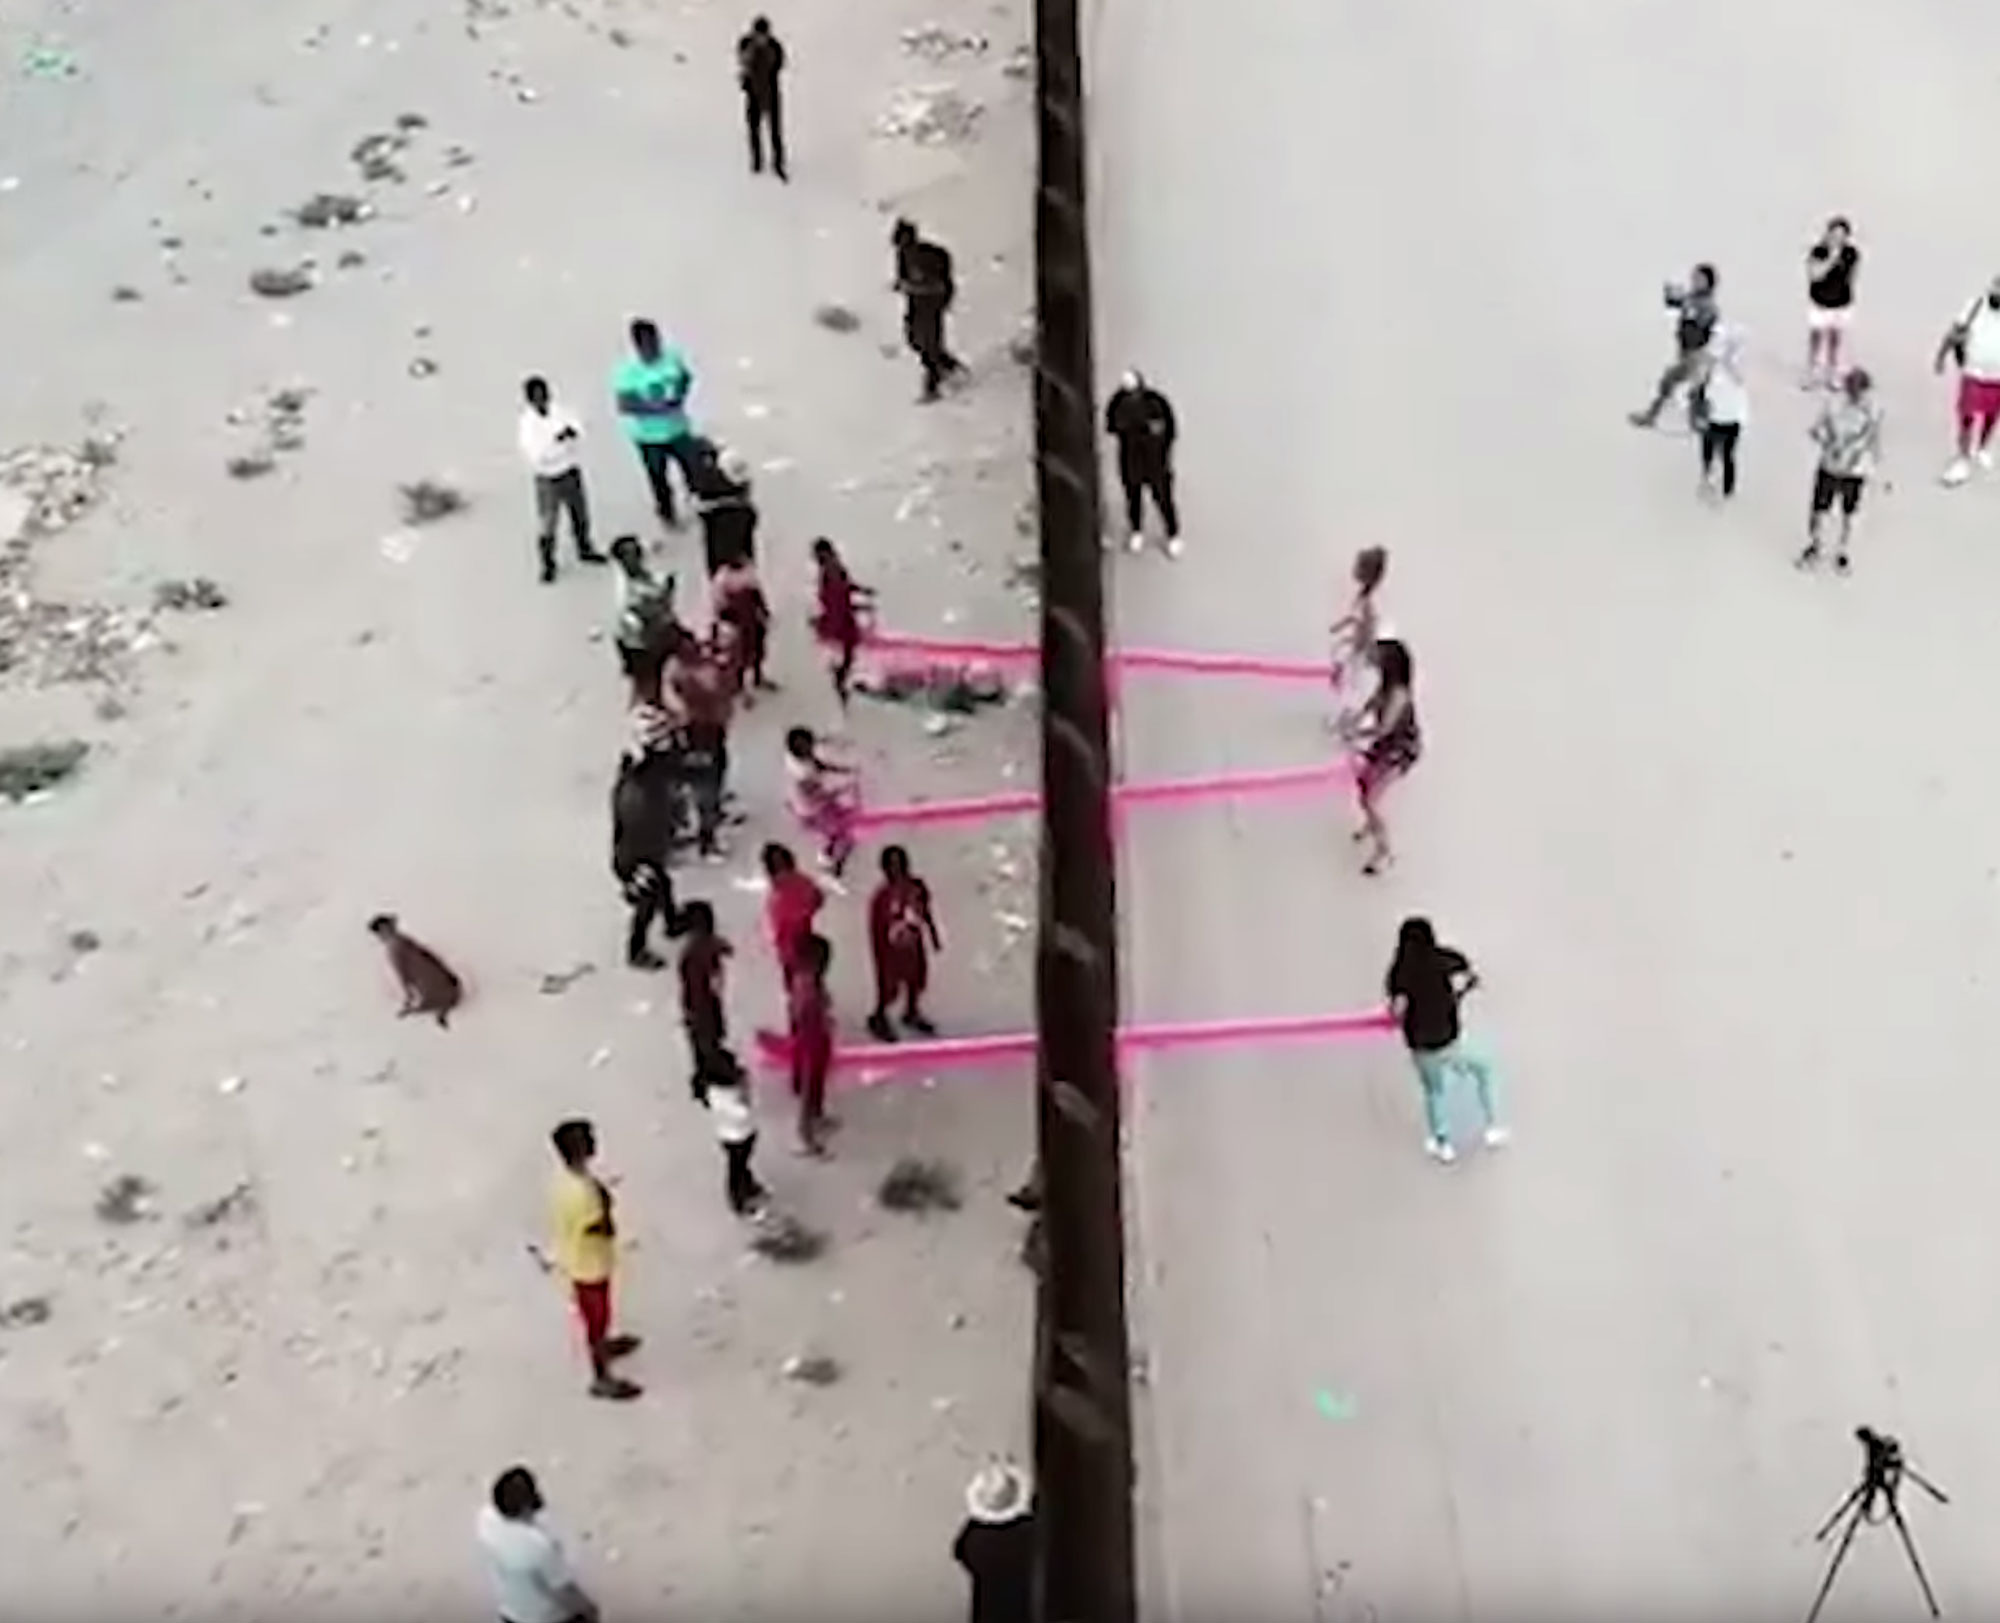 ronald rael pinke wippen grenzzaun